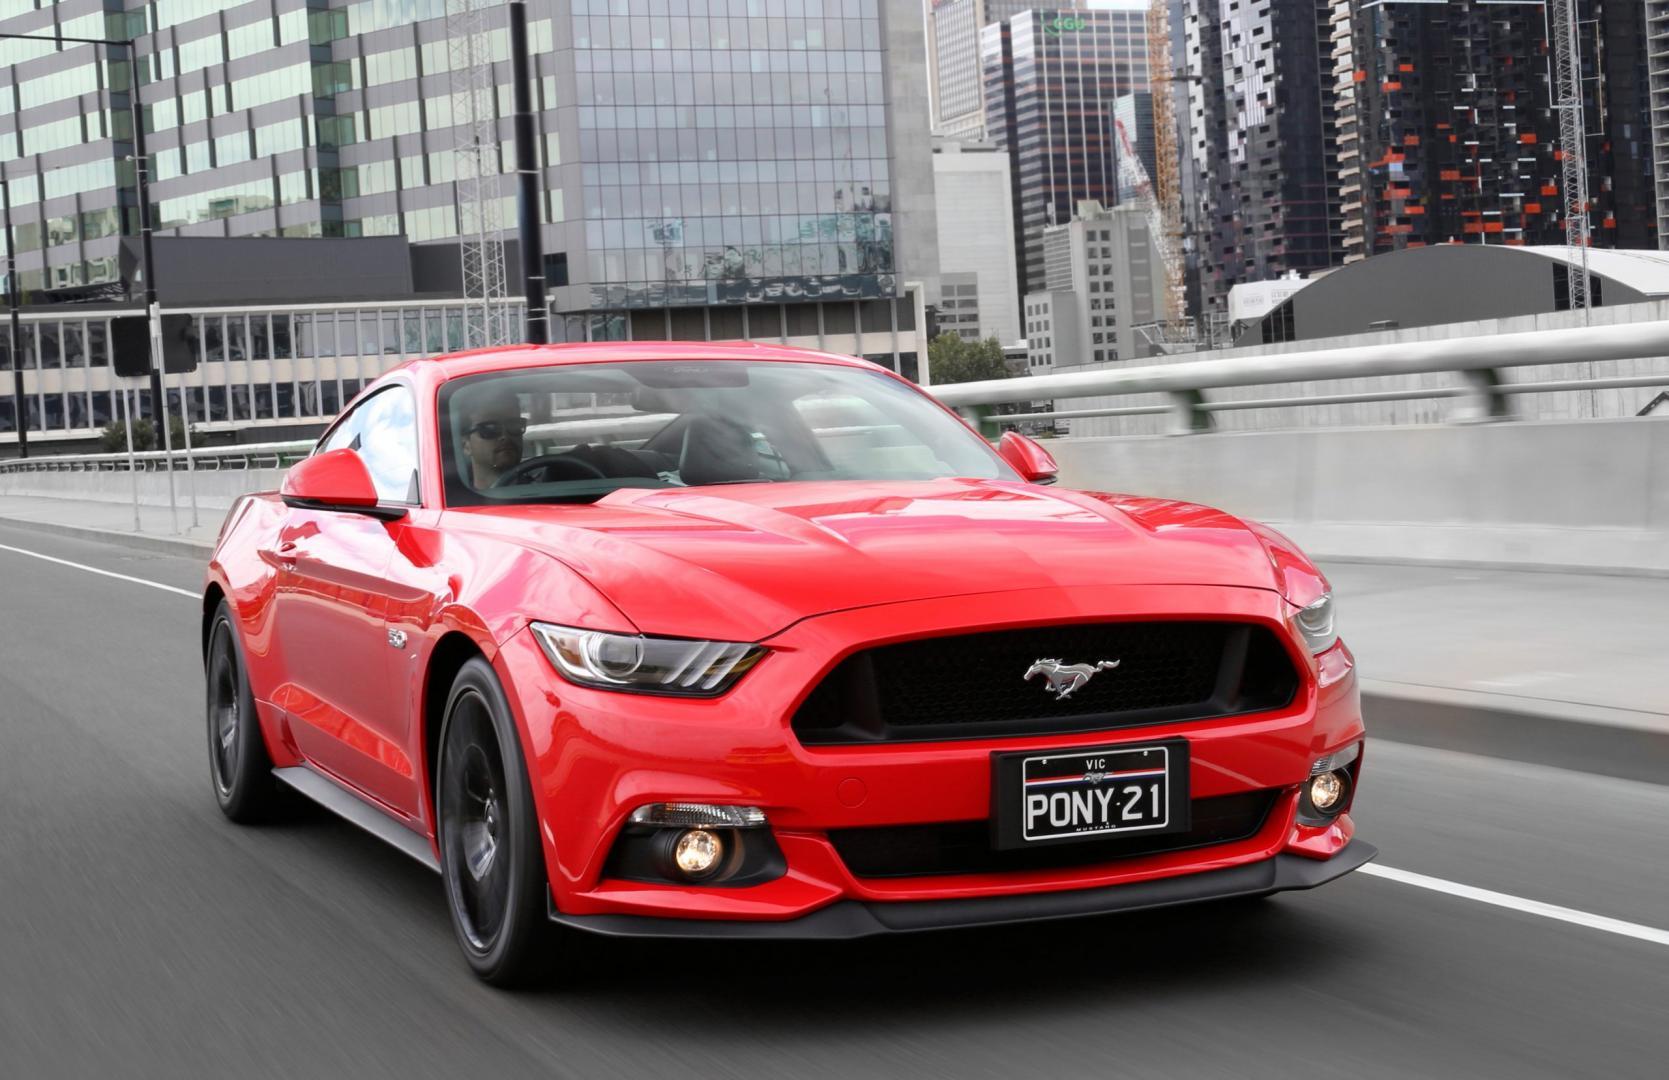 Ford Mustang in Australie